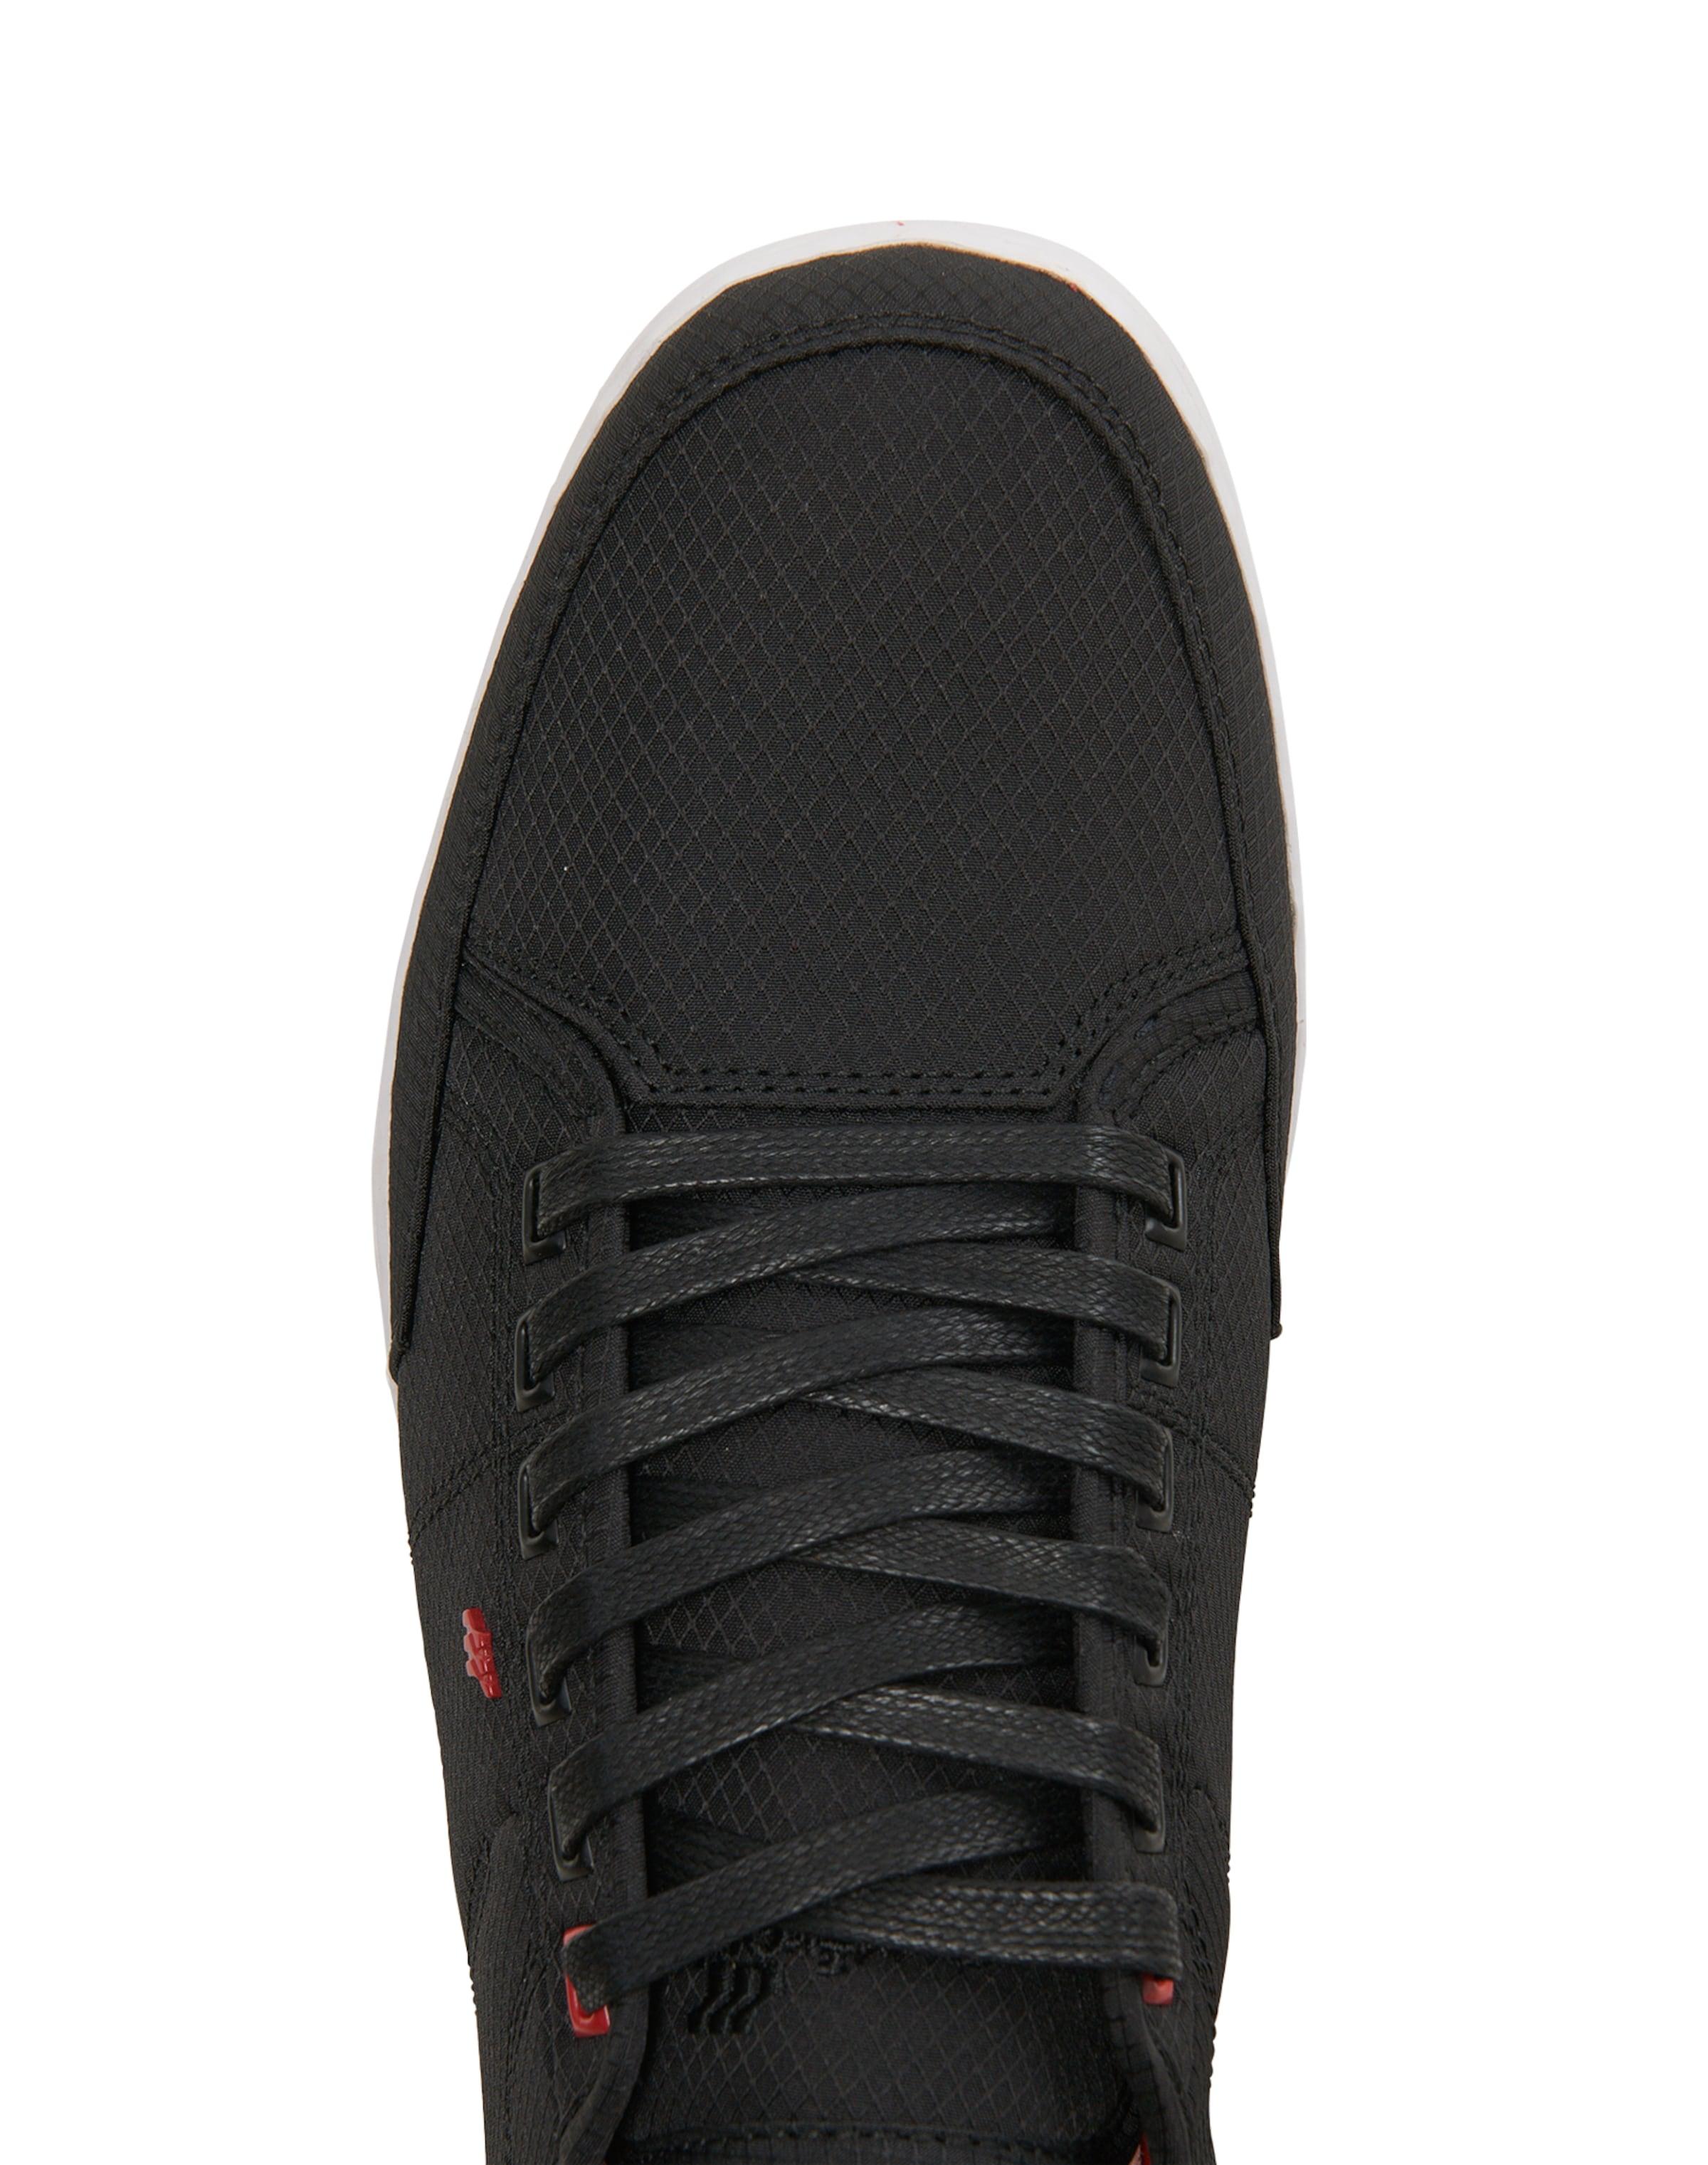 'sparko' RotSchwarz Boxfresh Weiß In Sneaker 5L4RjA3